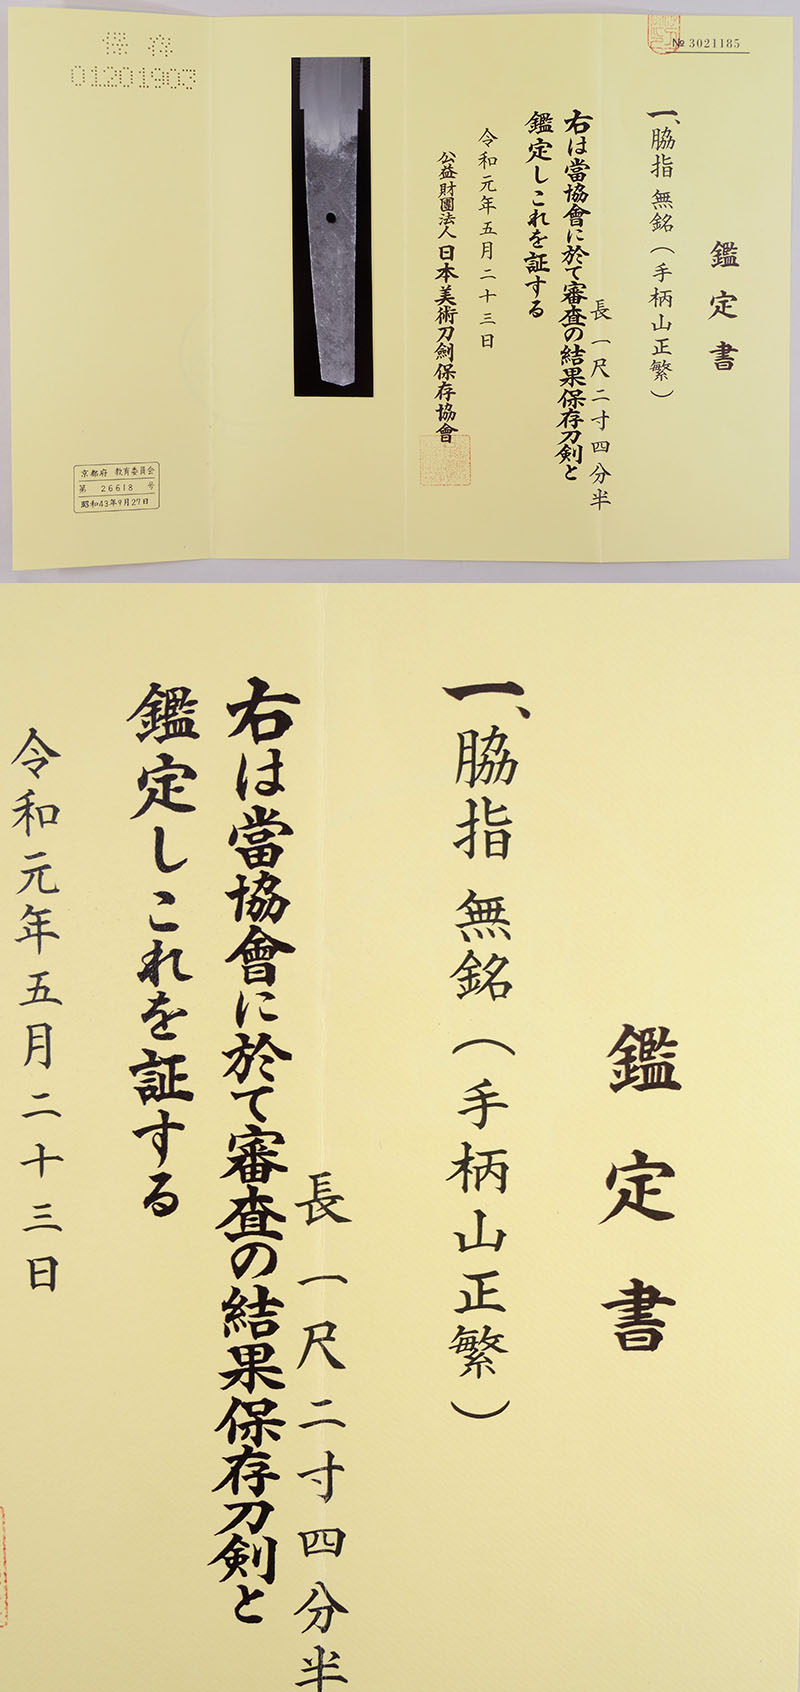 無銘(手柄山正繁) Picture of Certificate